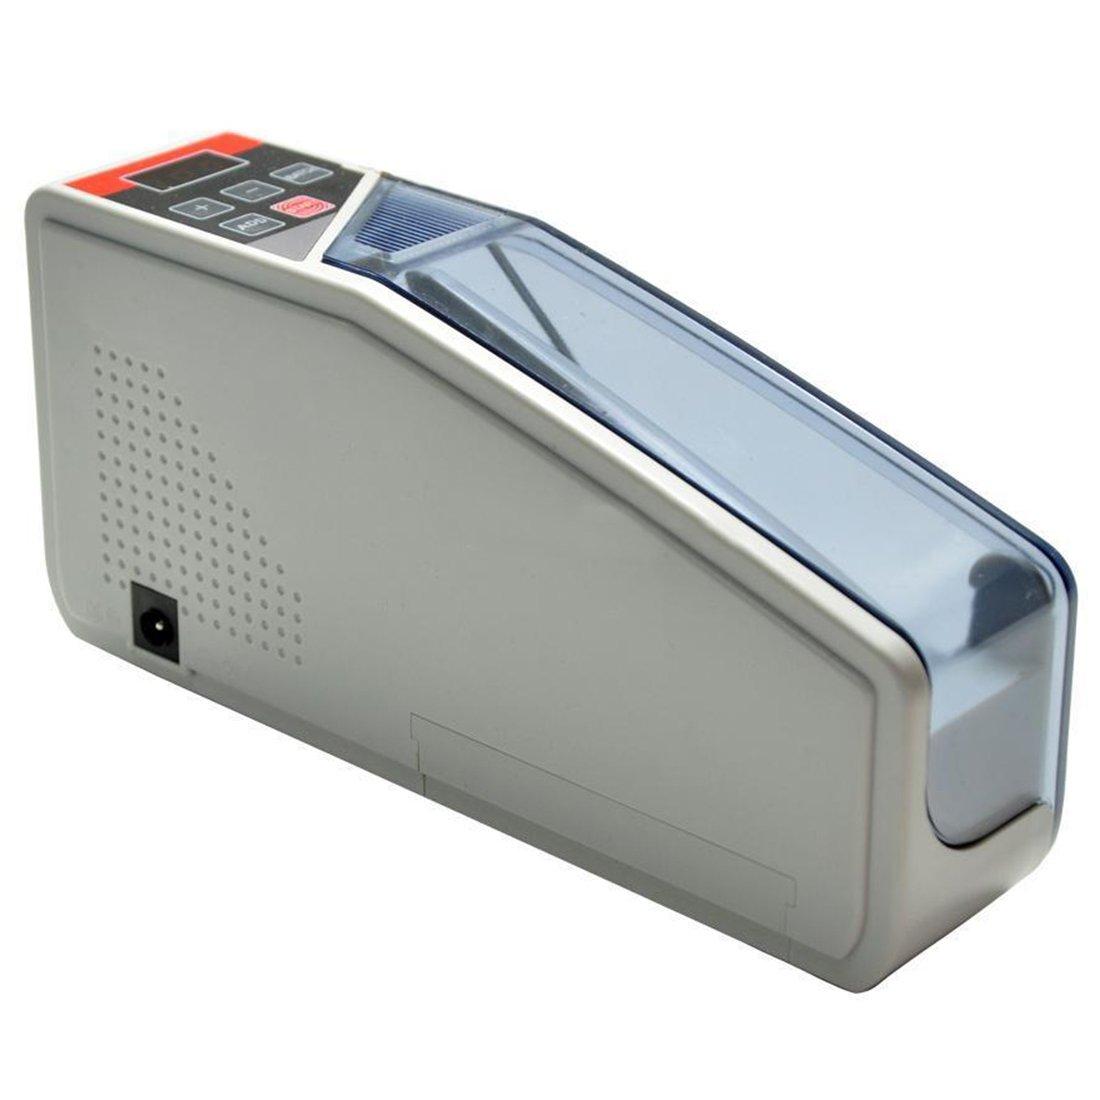 Counter Machine - SODIAL(R) Handy Bill Cash Count Portable Mini Money Currency Counter Machine 100-240V